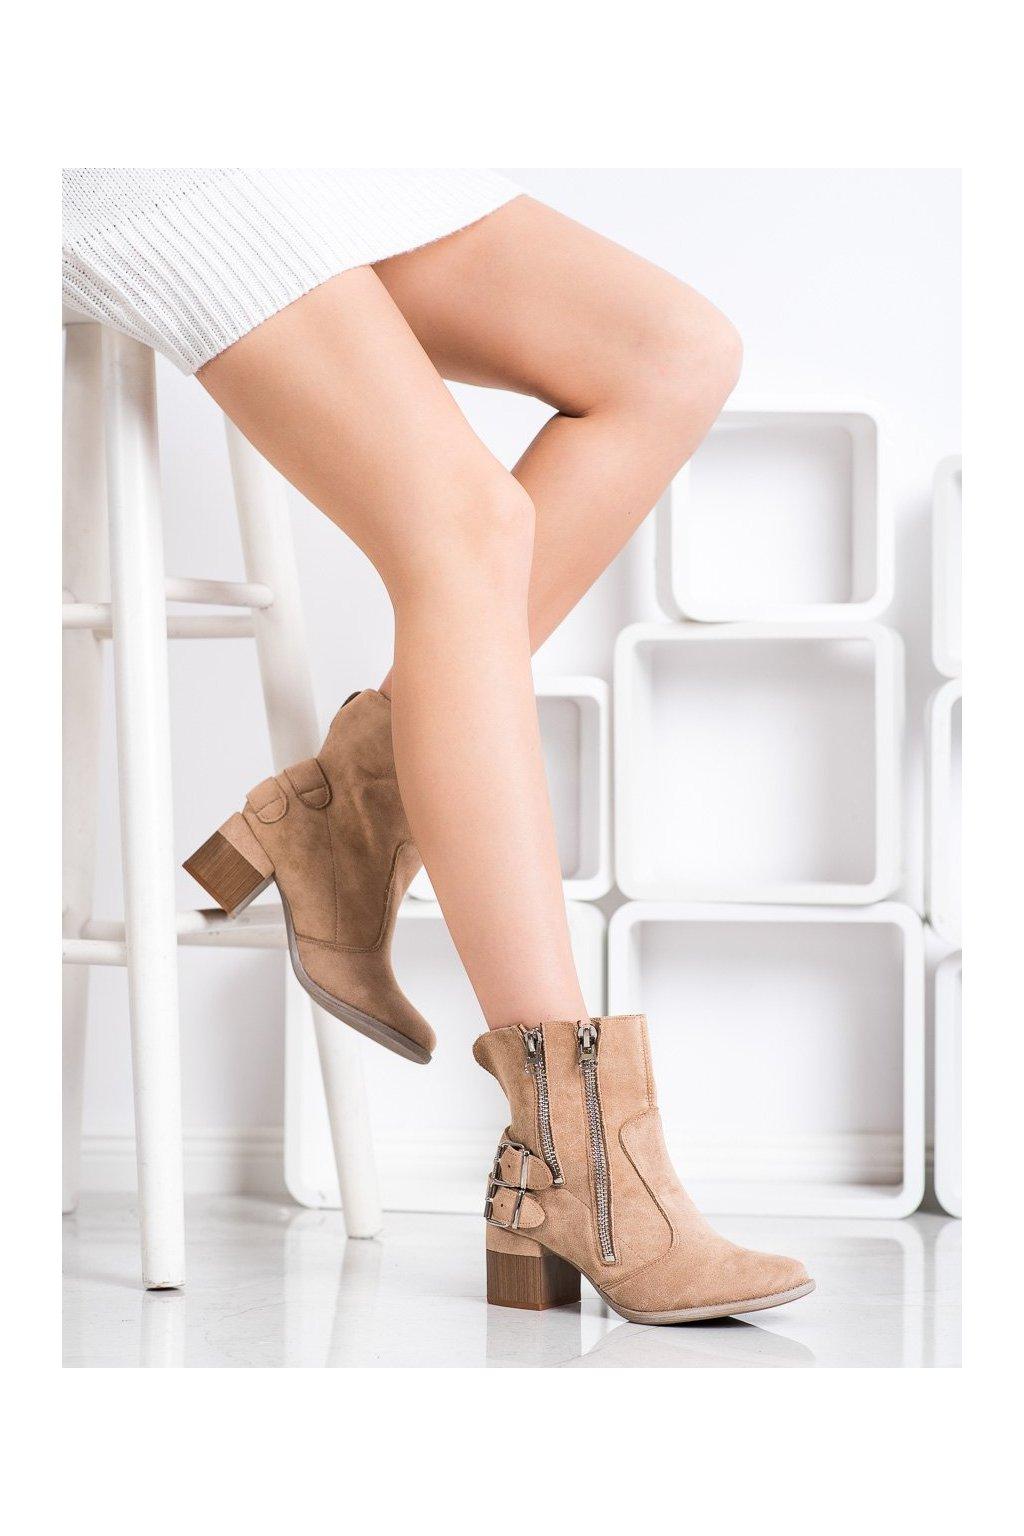 Hnedé dámske topánky Bella paris kod A6110KH